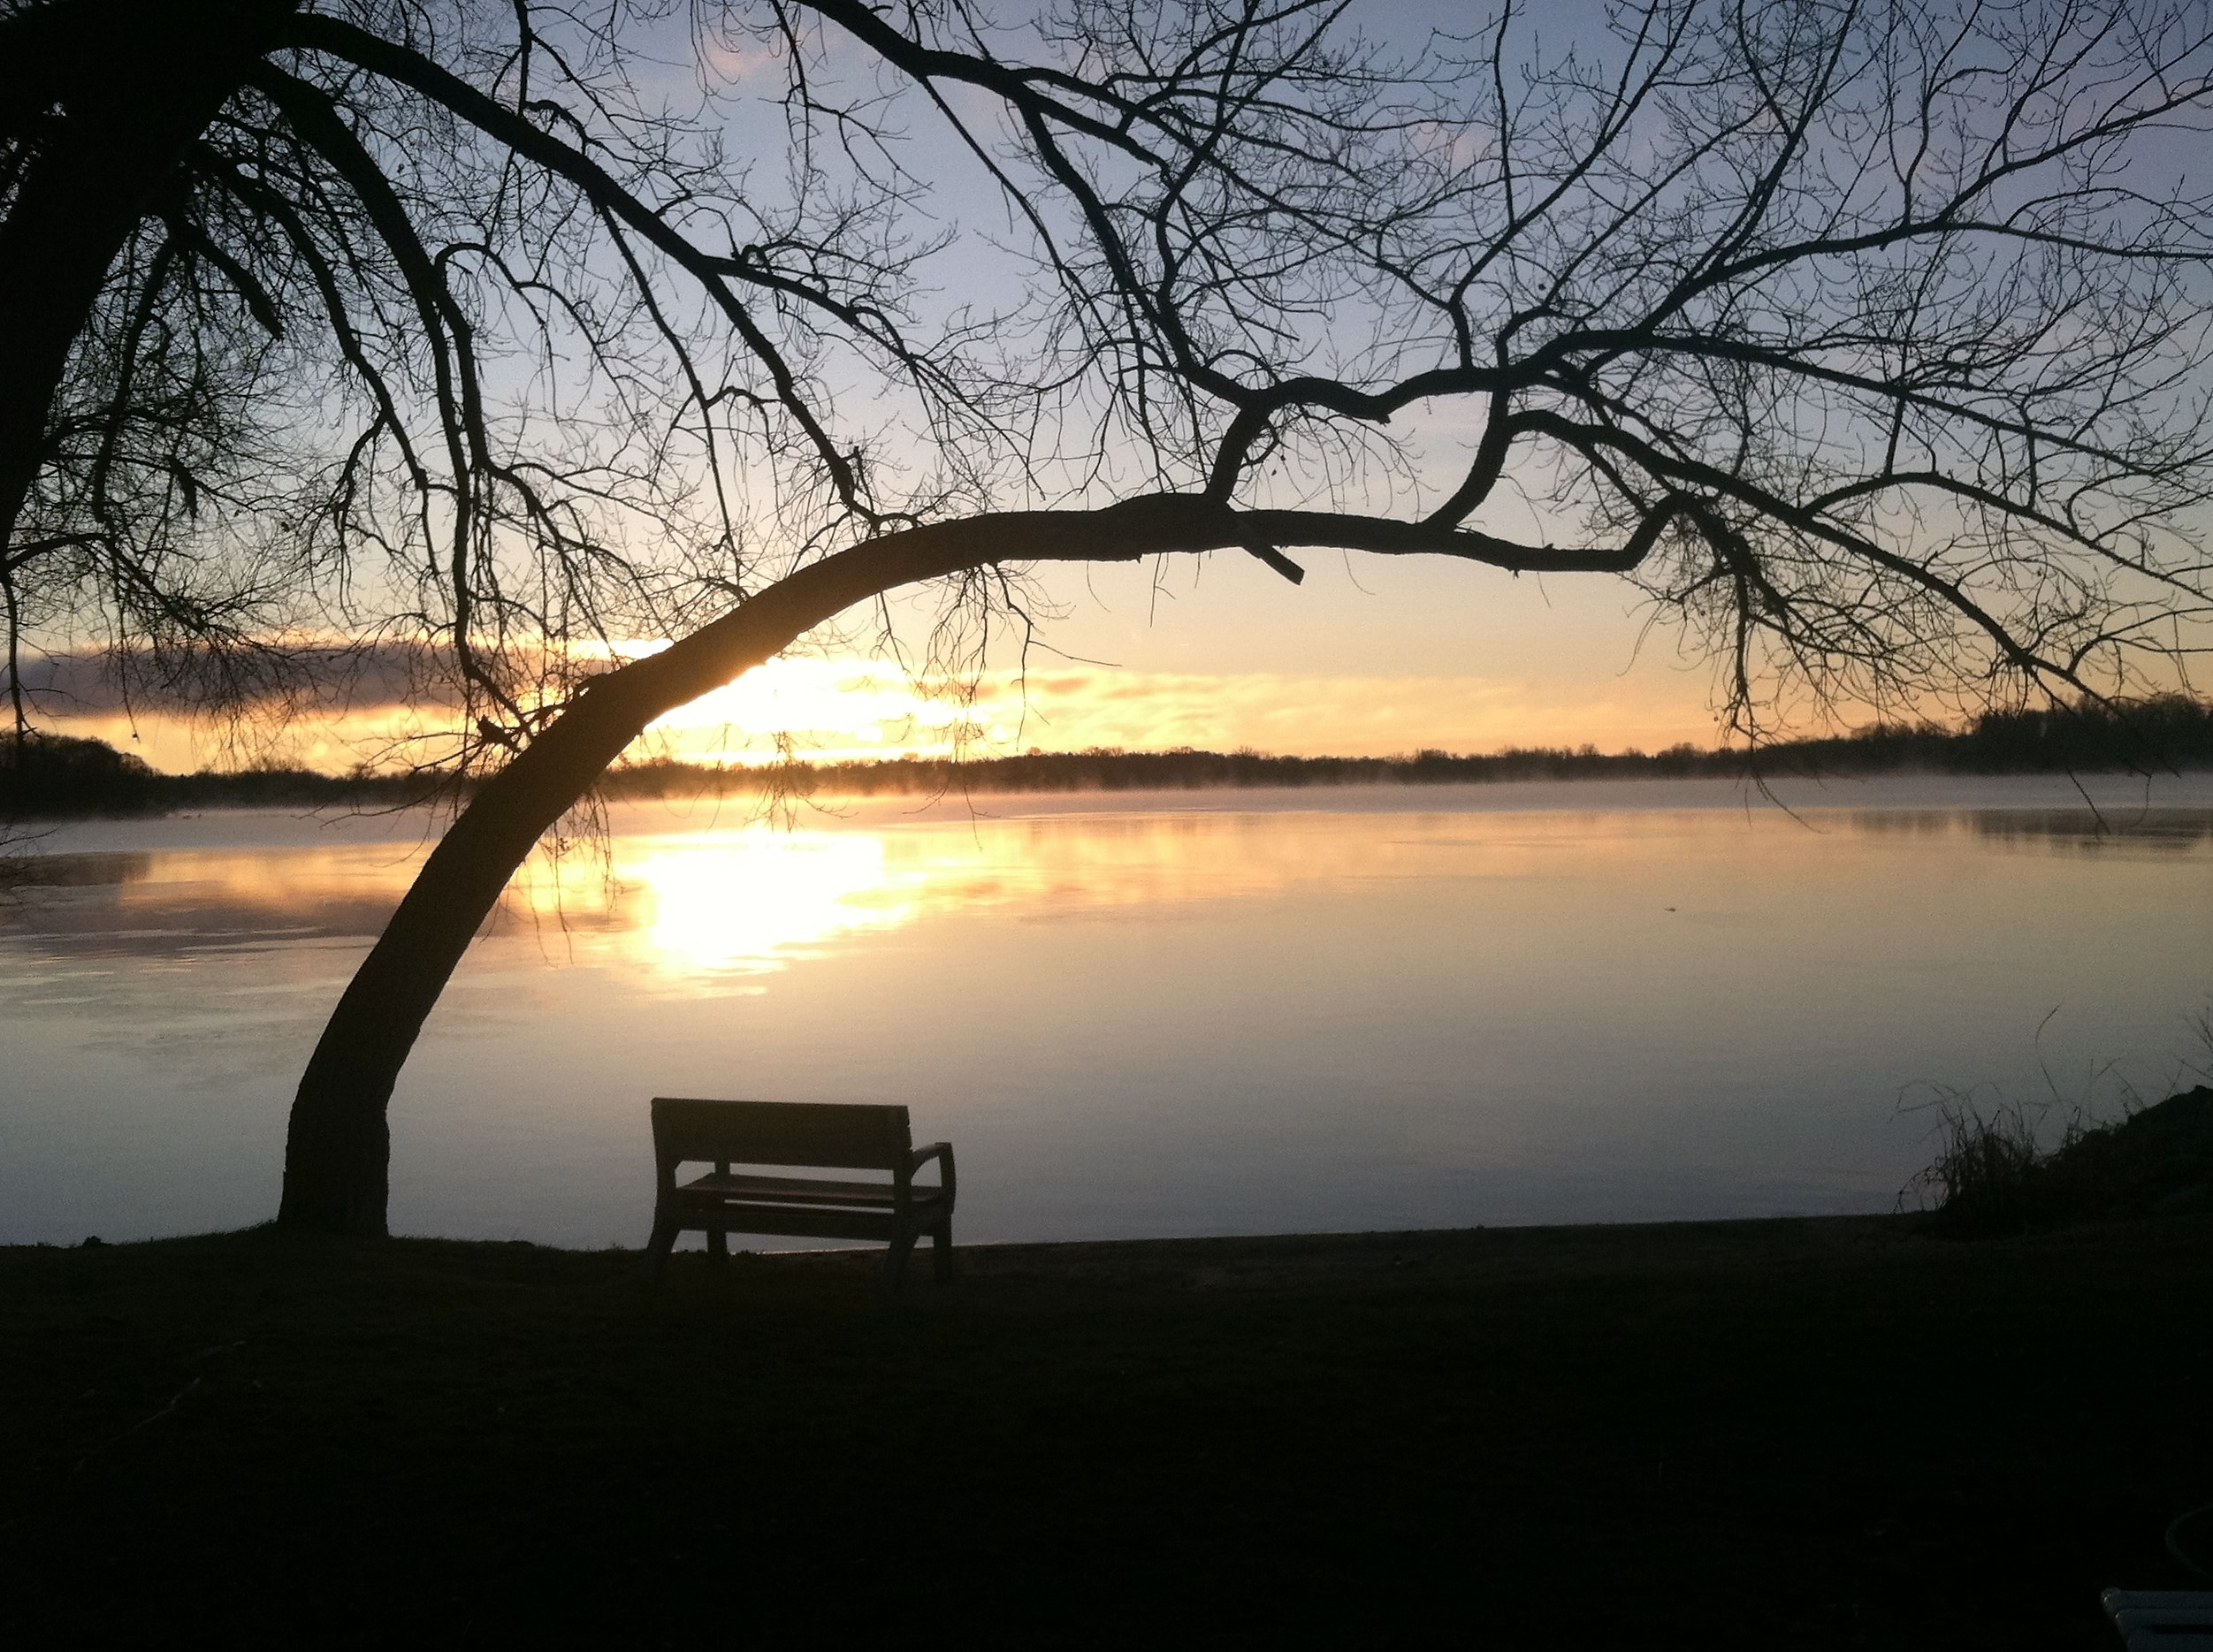 Lakeside Lakeview